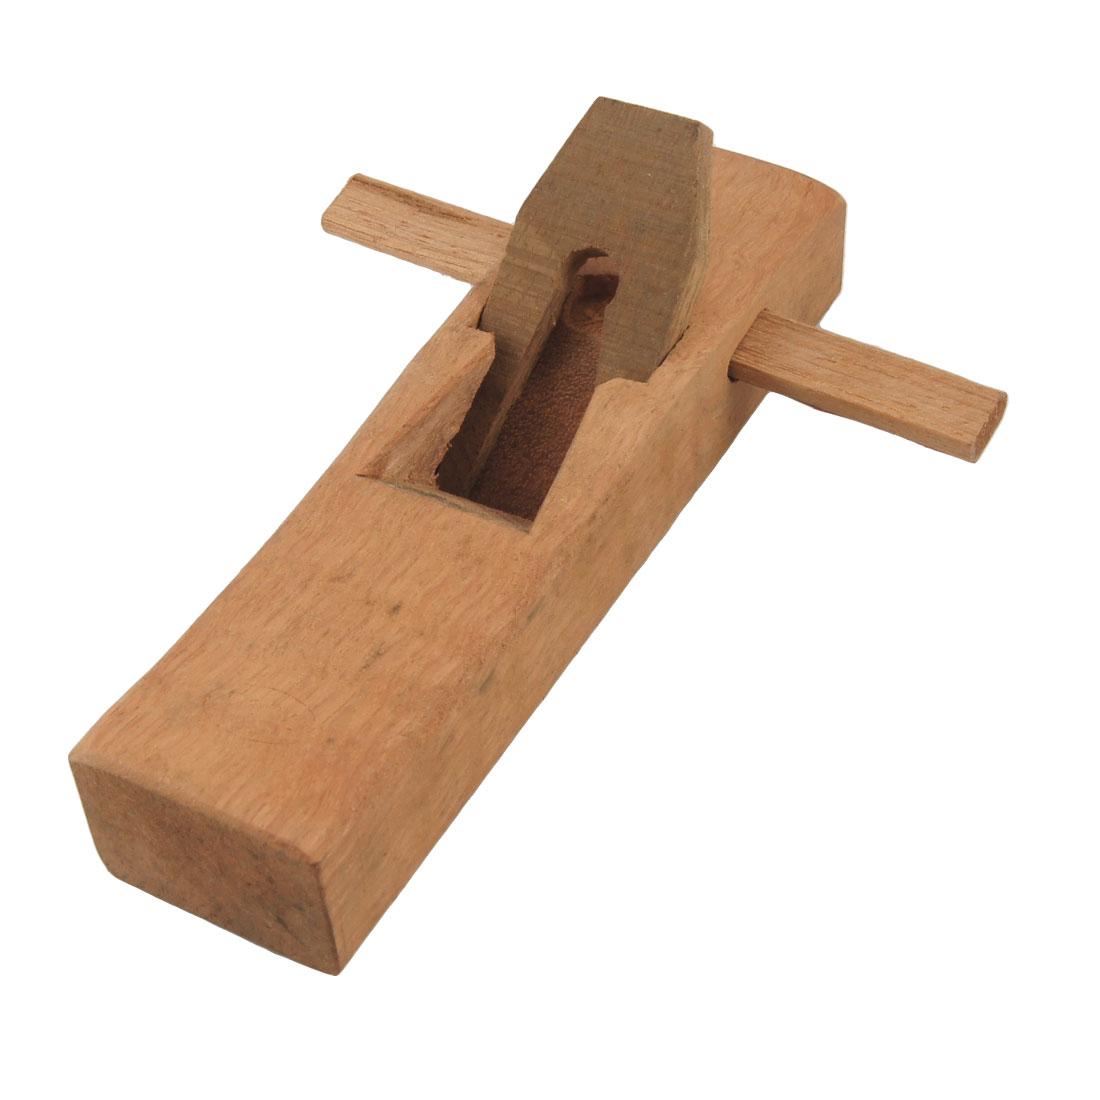 "Cabinetmaker Carpenter Manual Woodworking 9.6"" Long Wood Planer"